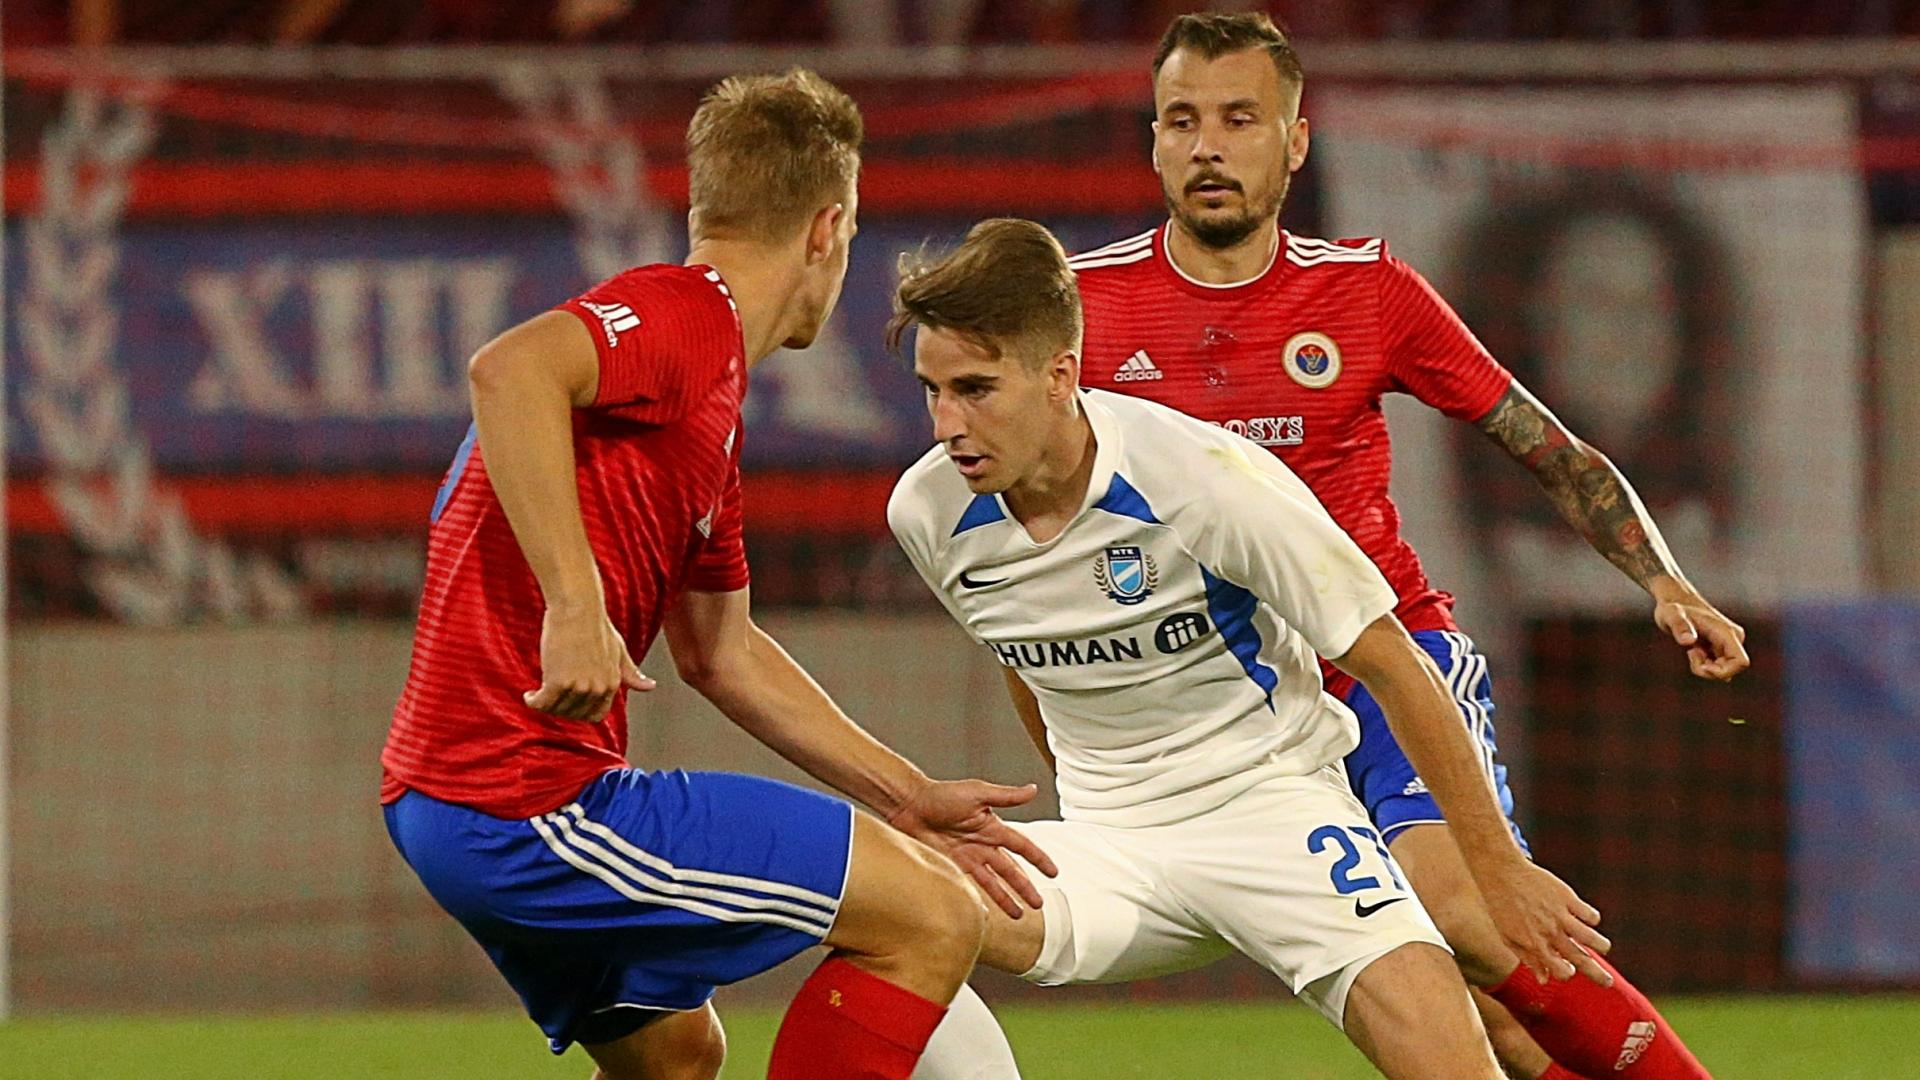 Bemutatjuk szombati ellenfelünket: Amit a Vasas FC-ről tudni kell